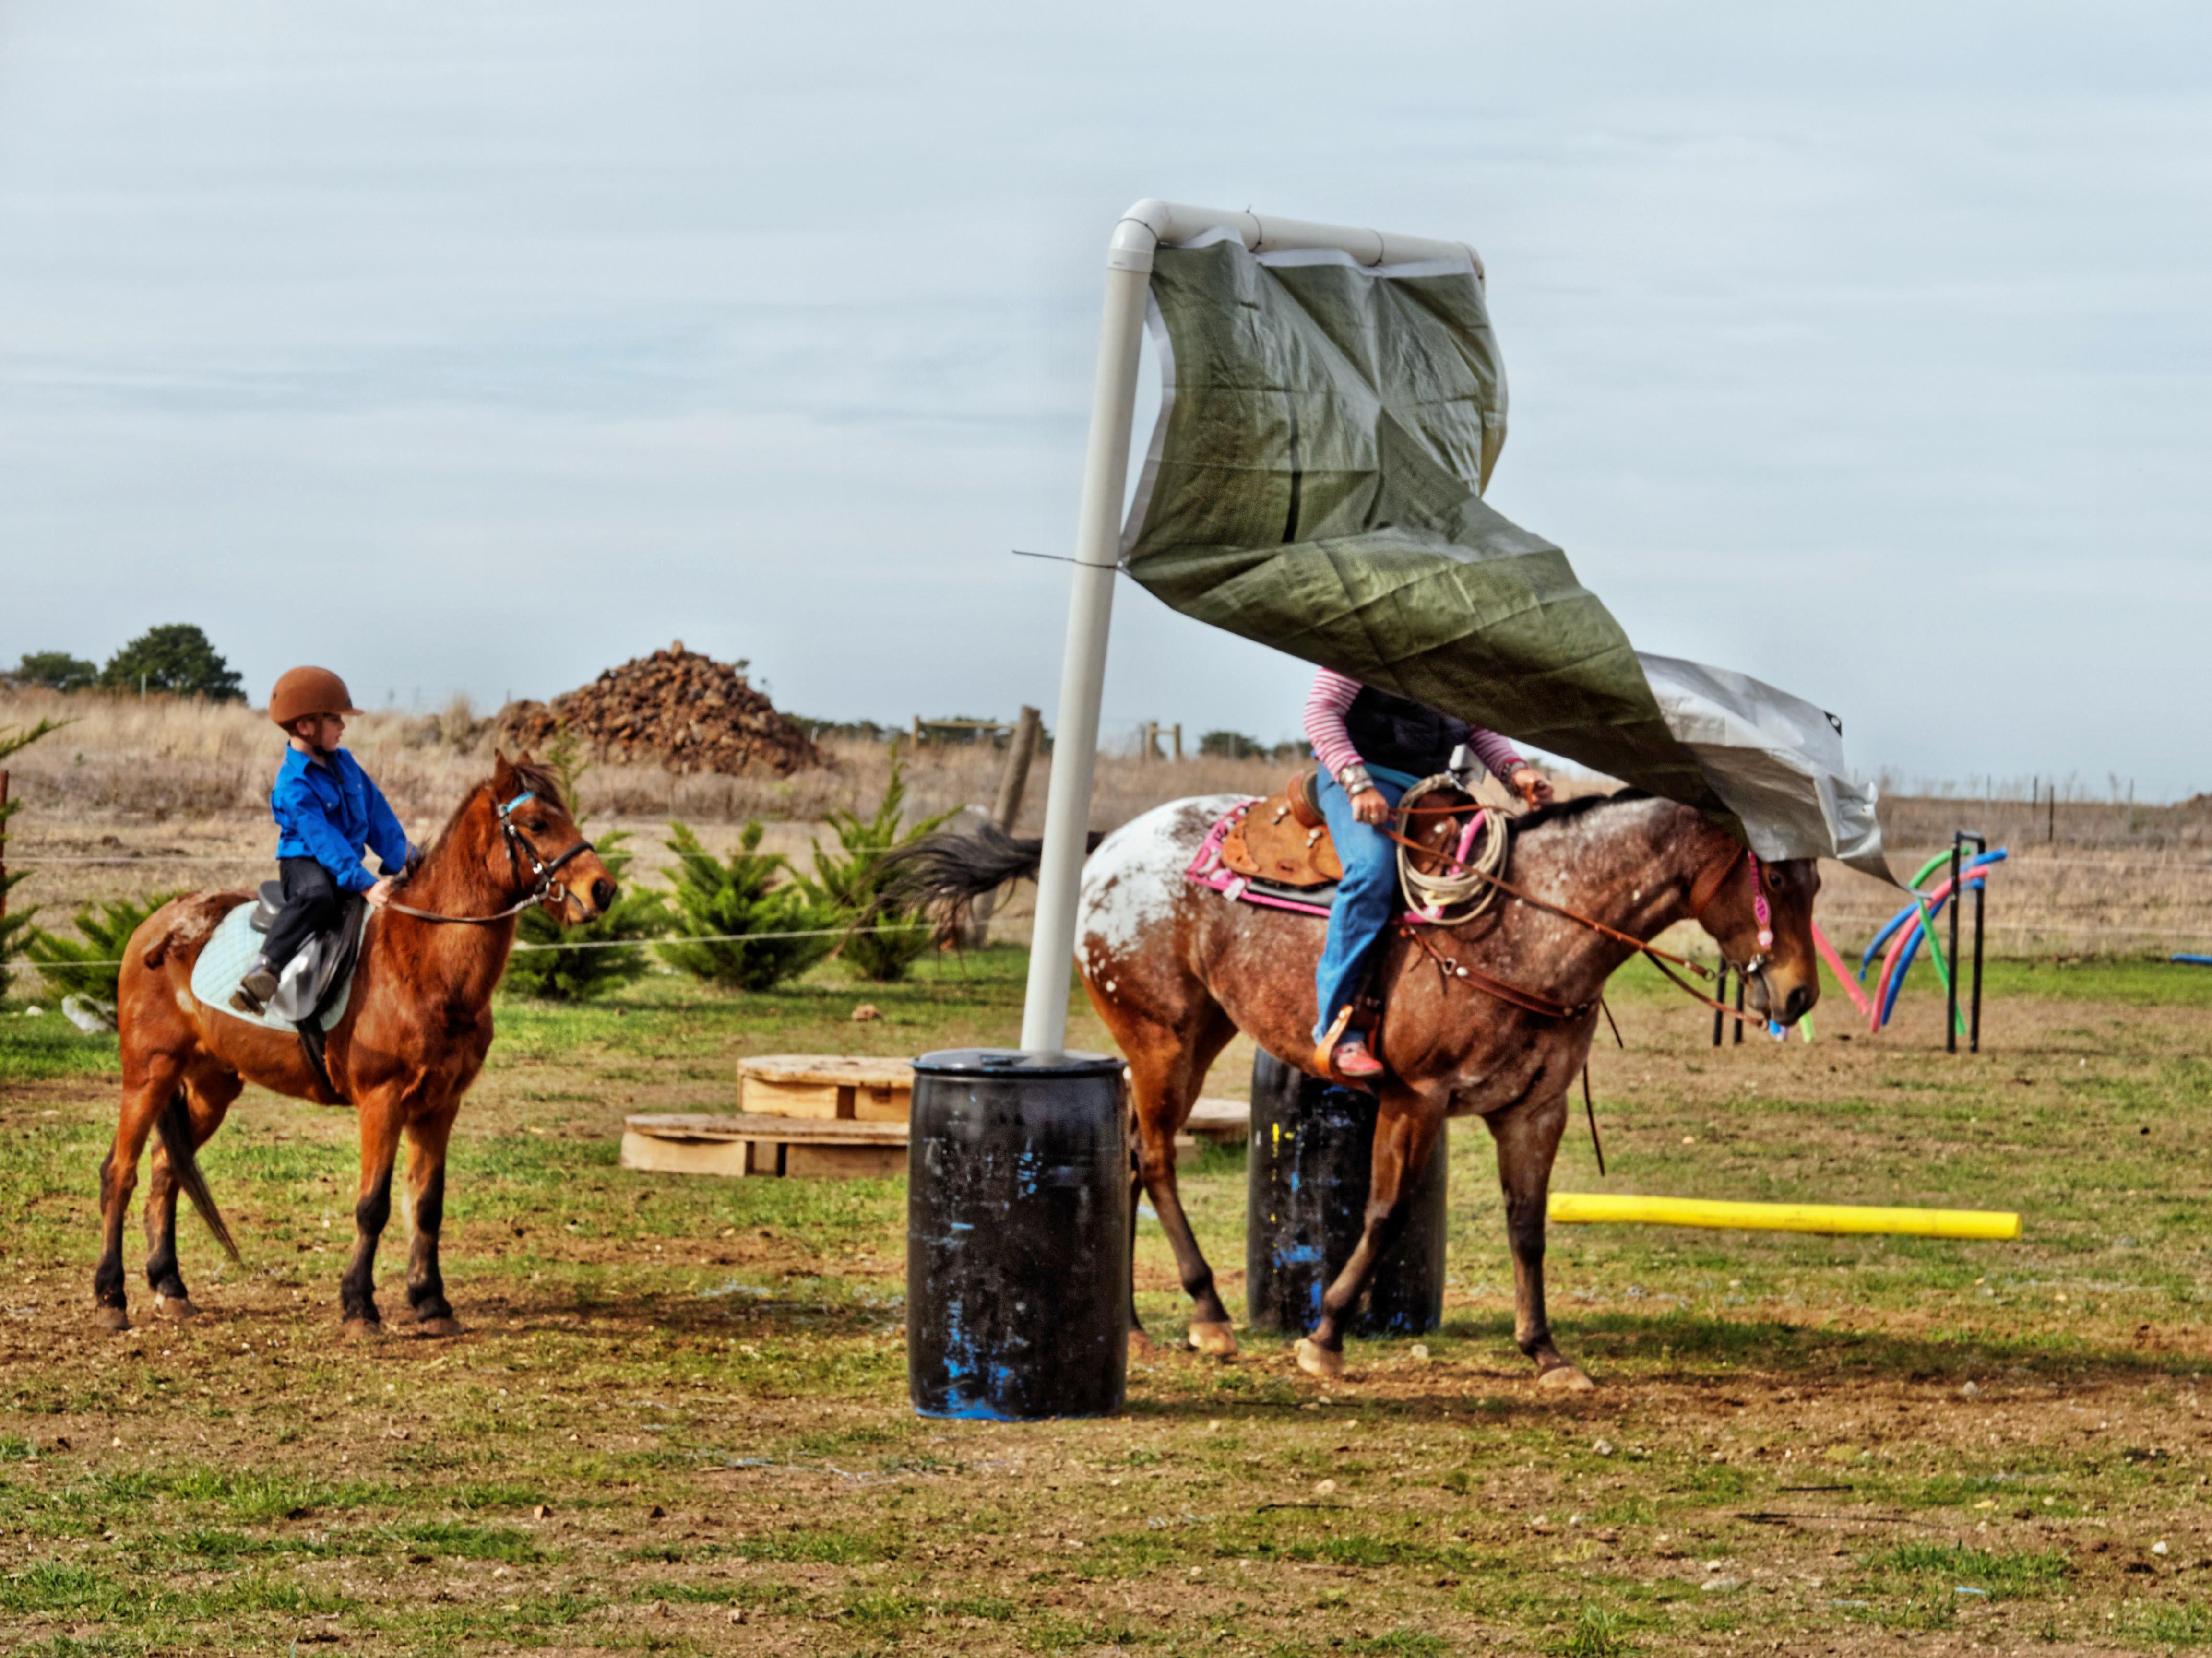 Extreme-cowboy-33.jpeg